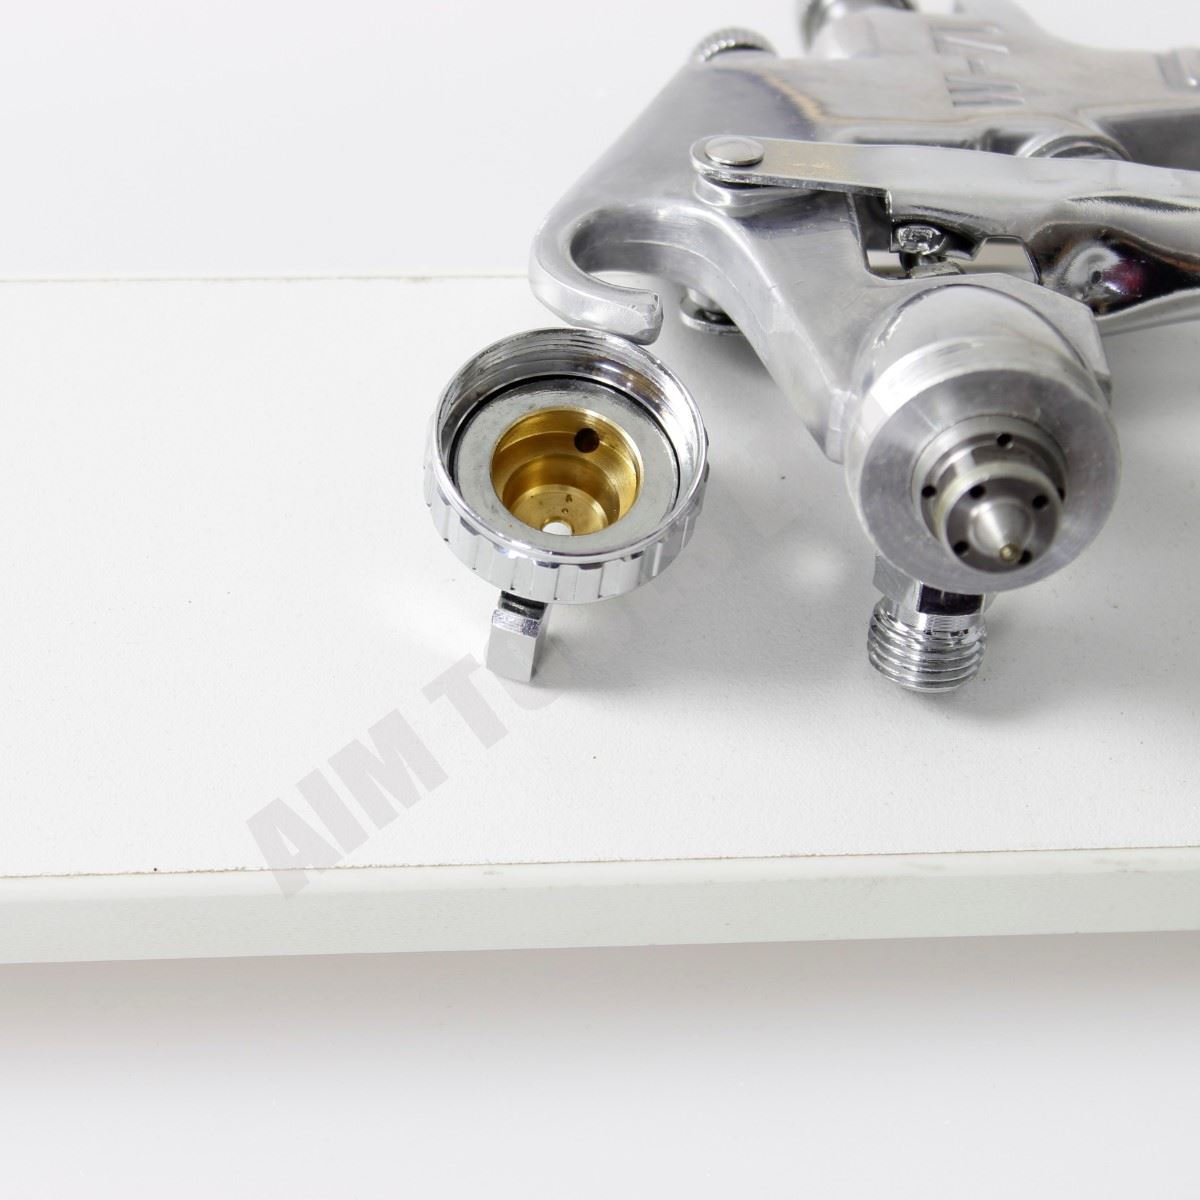 low pressure car truck furniture air paint spray gun hvlp type ebay. Black Bedroom Furniture Sets. Home Design Ideas